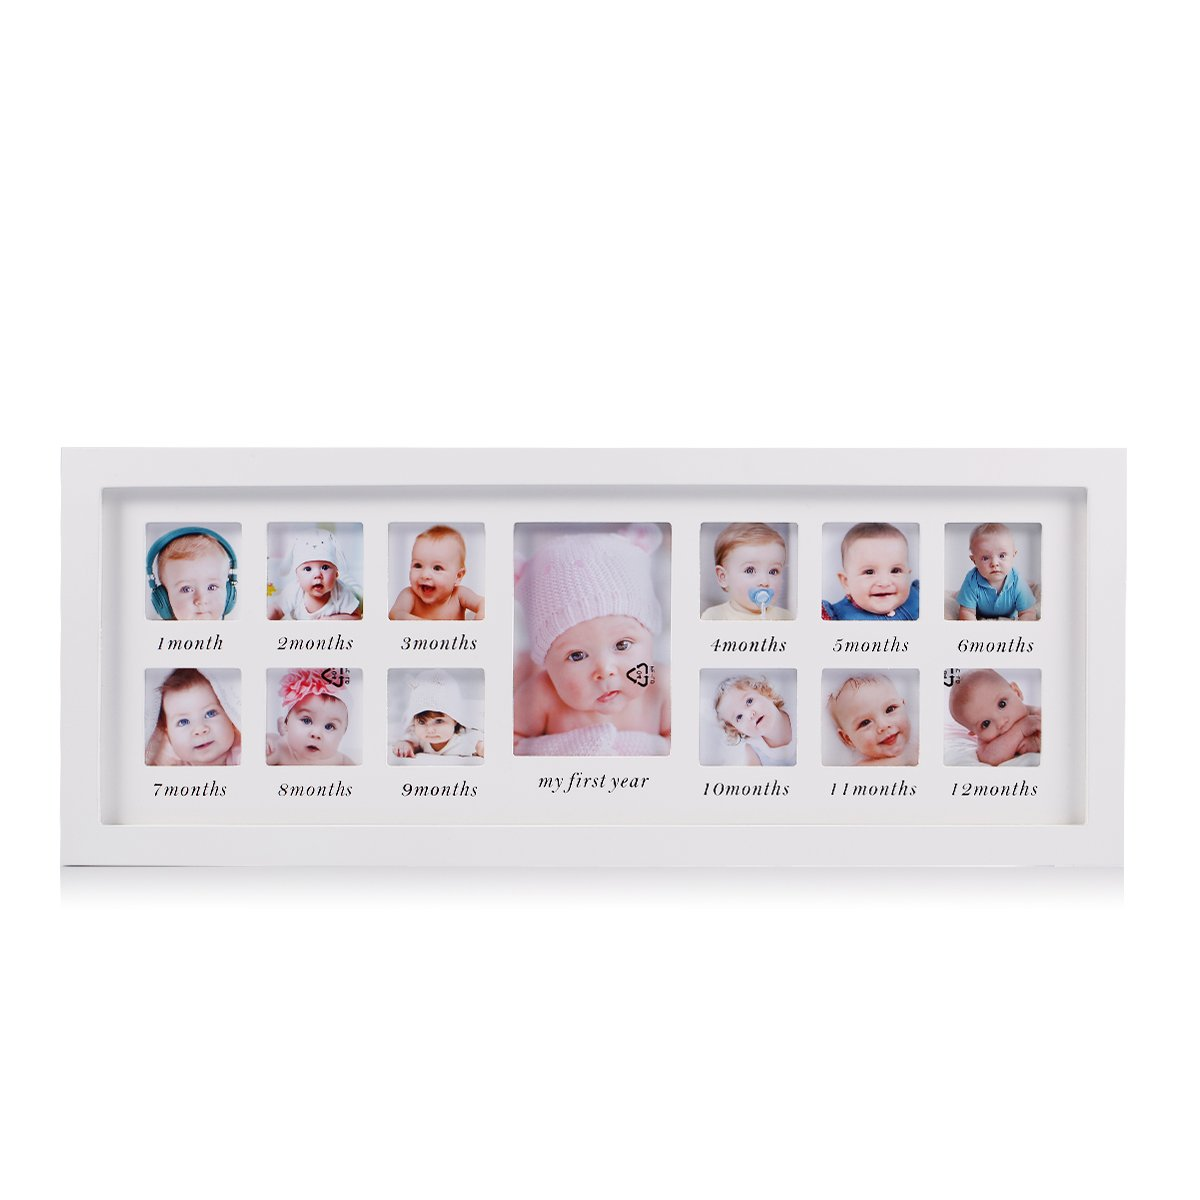 Amazon.com : Feibi My First Year Baby Photo Frame, Baby Keepsake ...